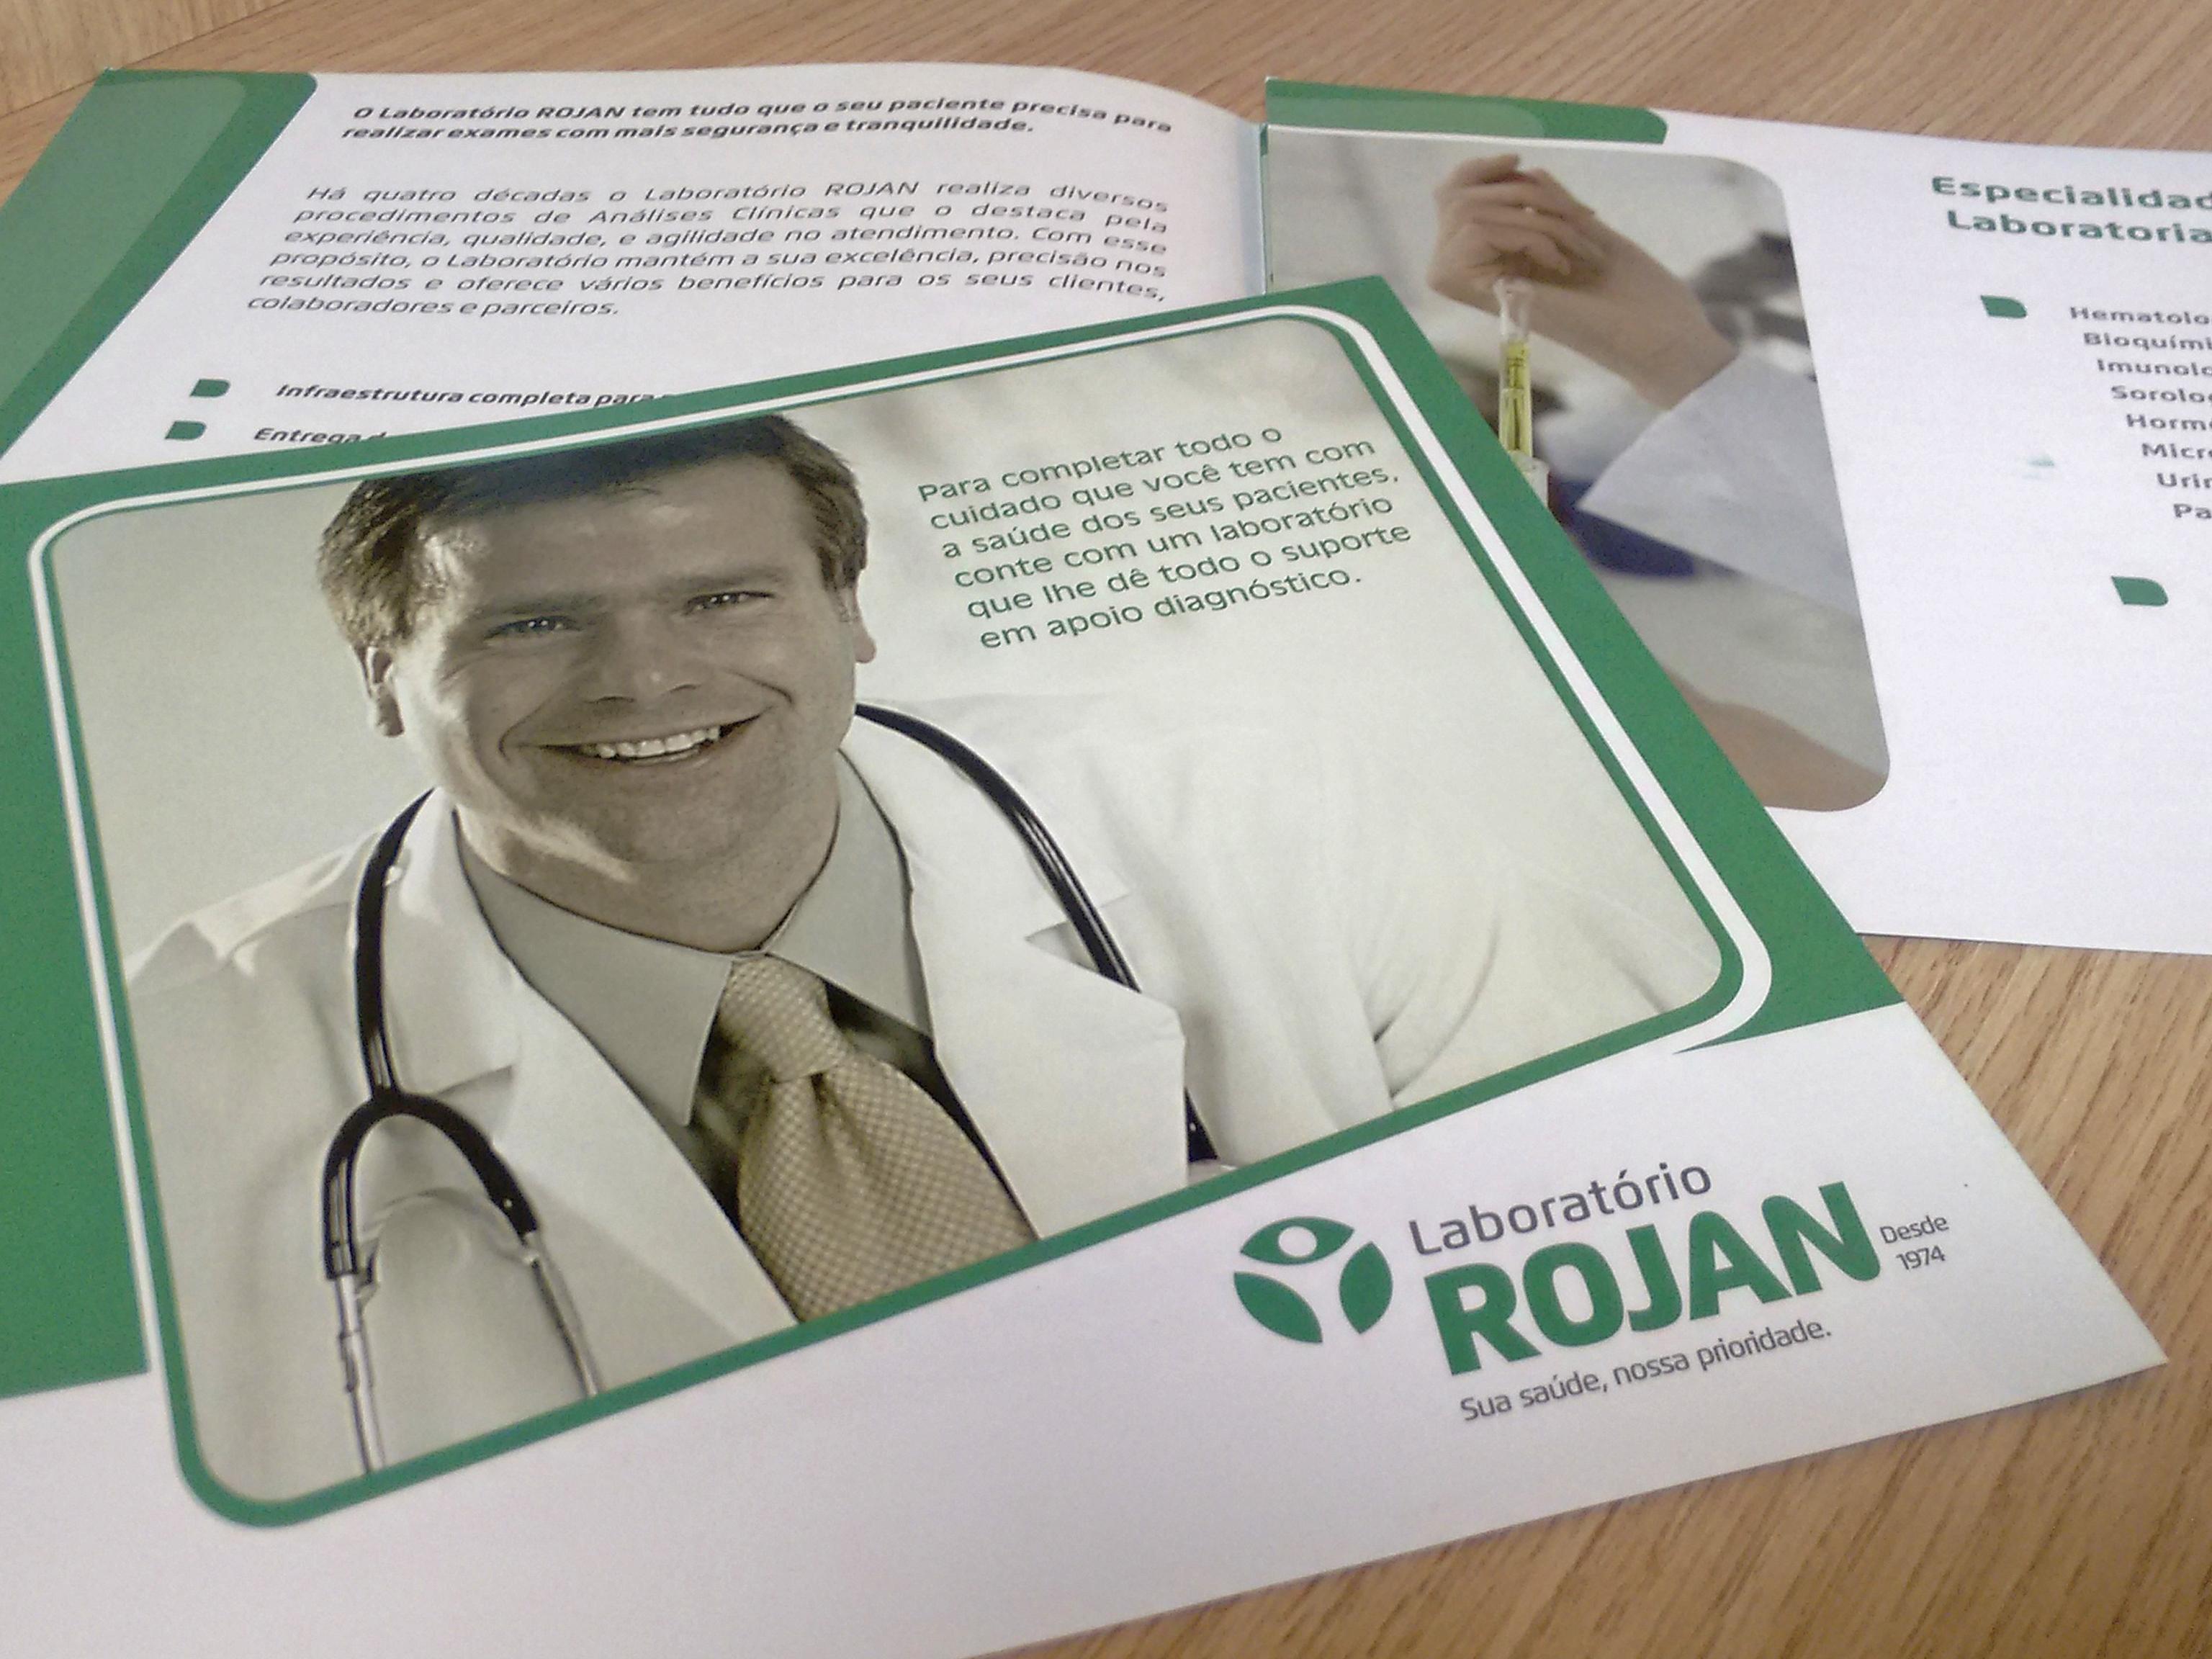 Laboratório Rojan